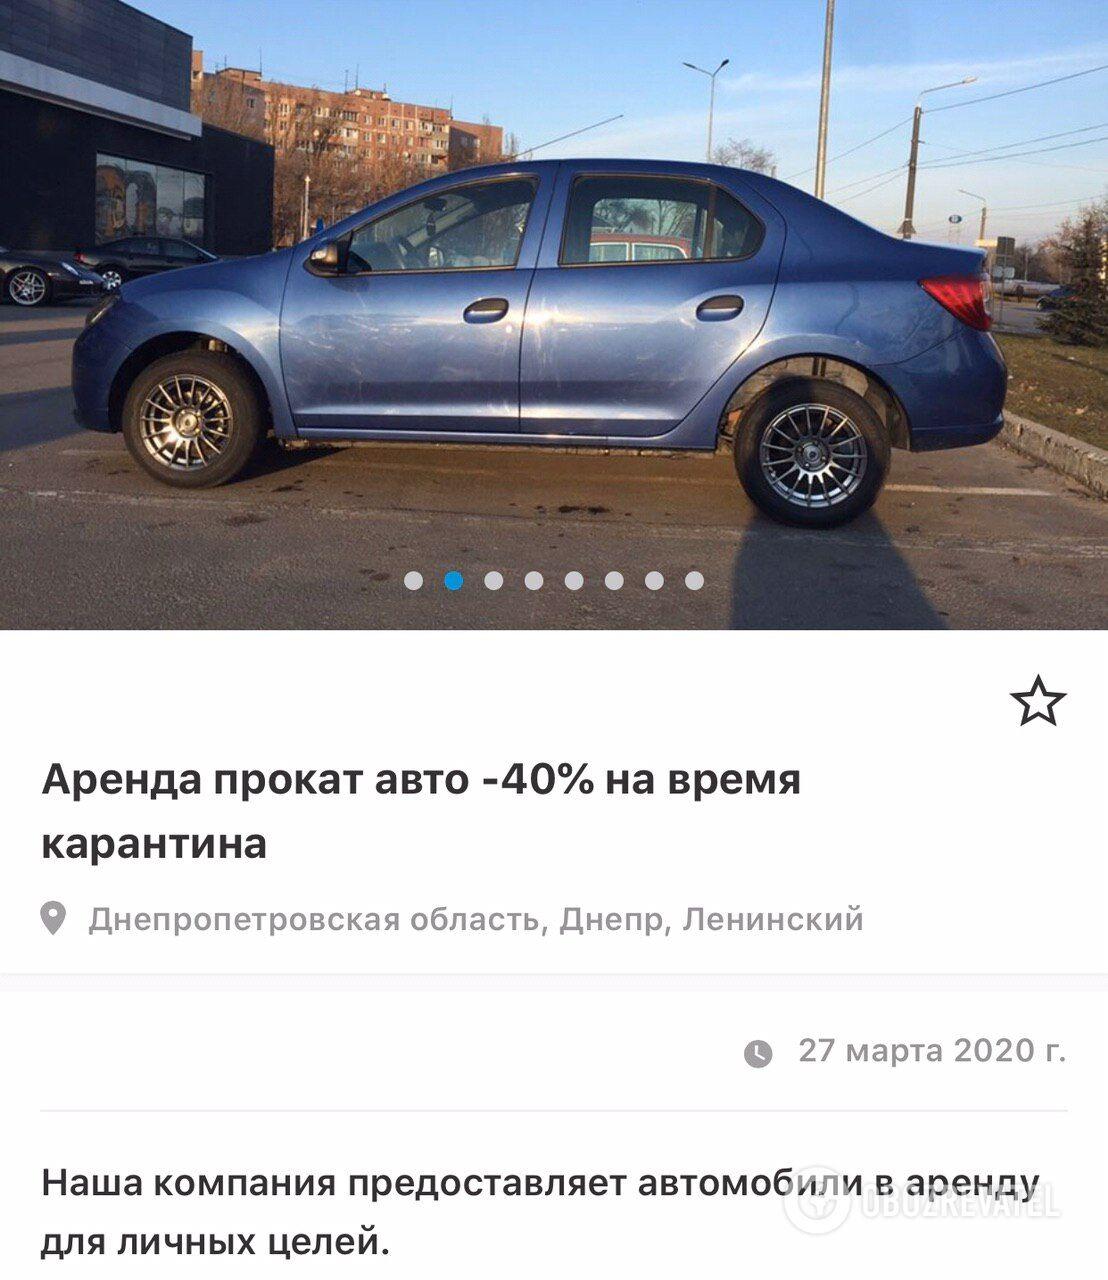 Оренда автомобіля